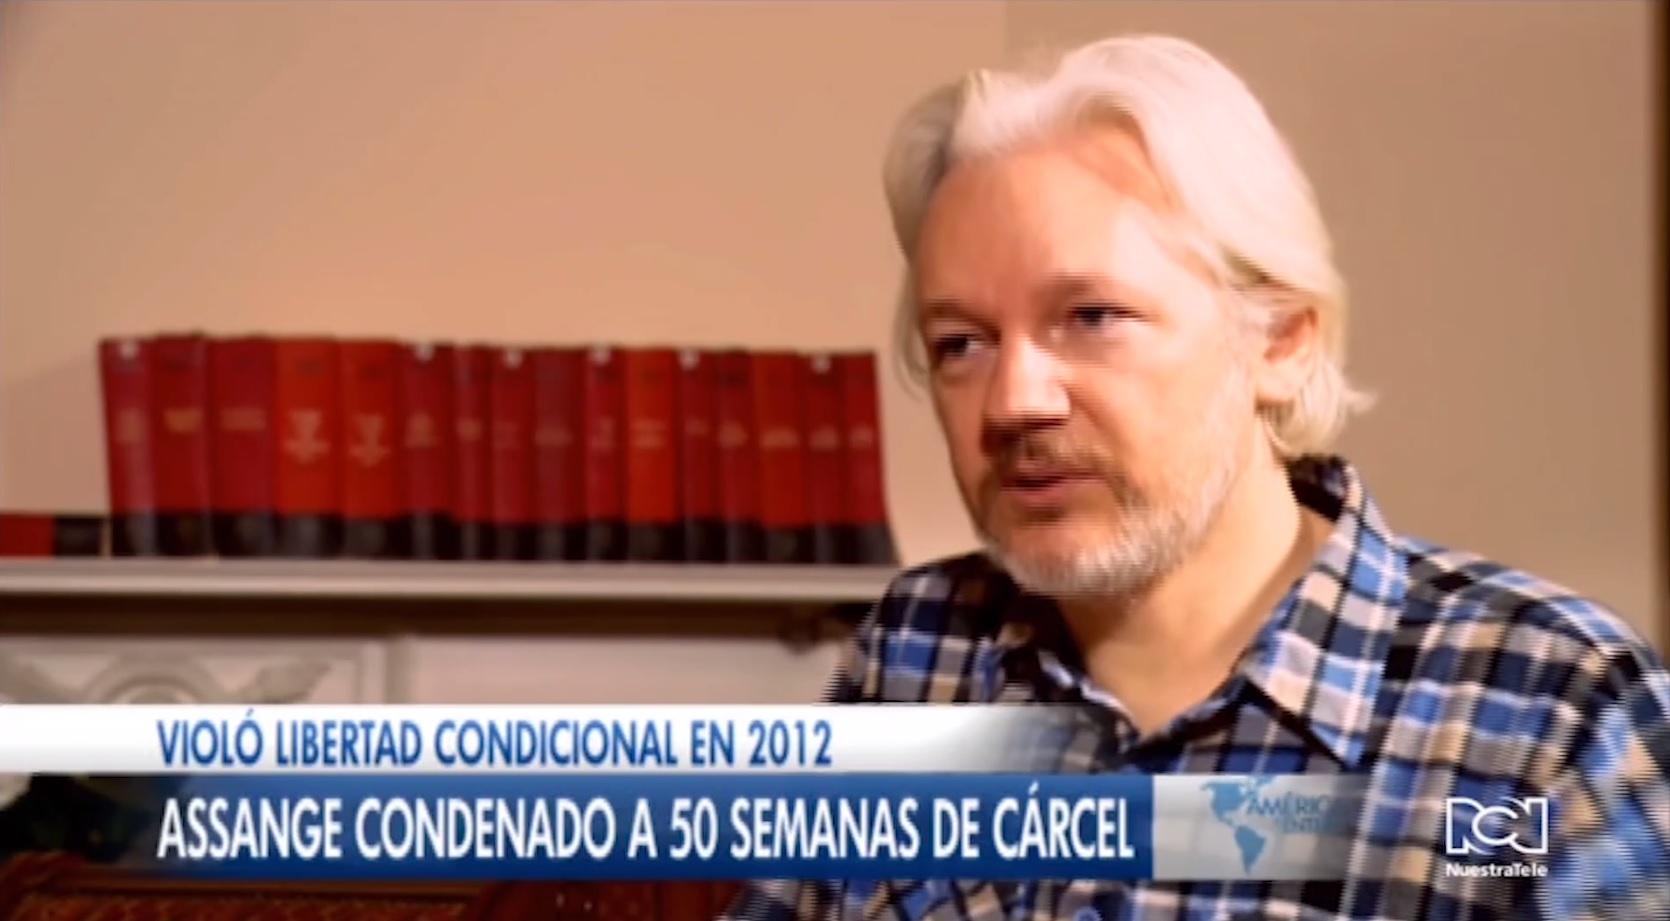 assange-condenado-11-meses-de-carcel.jpg